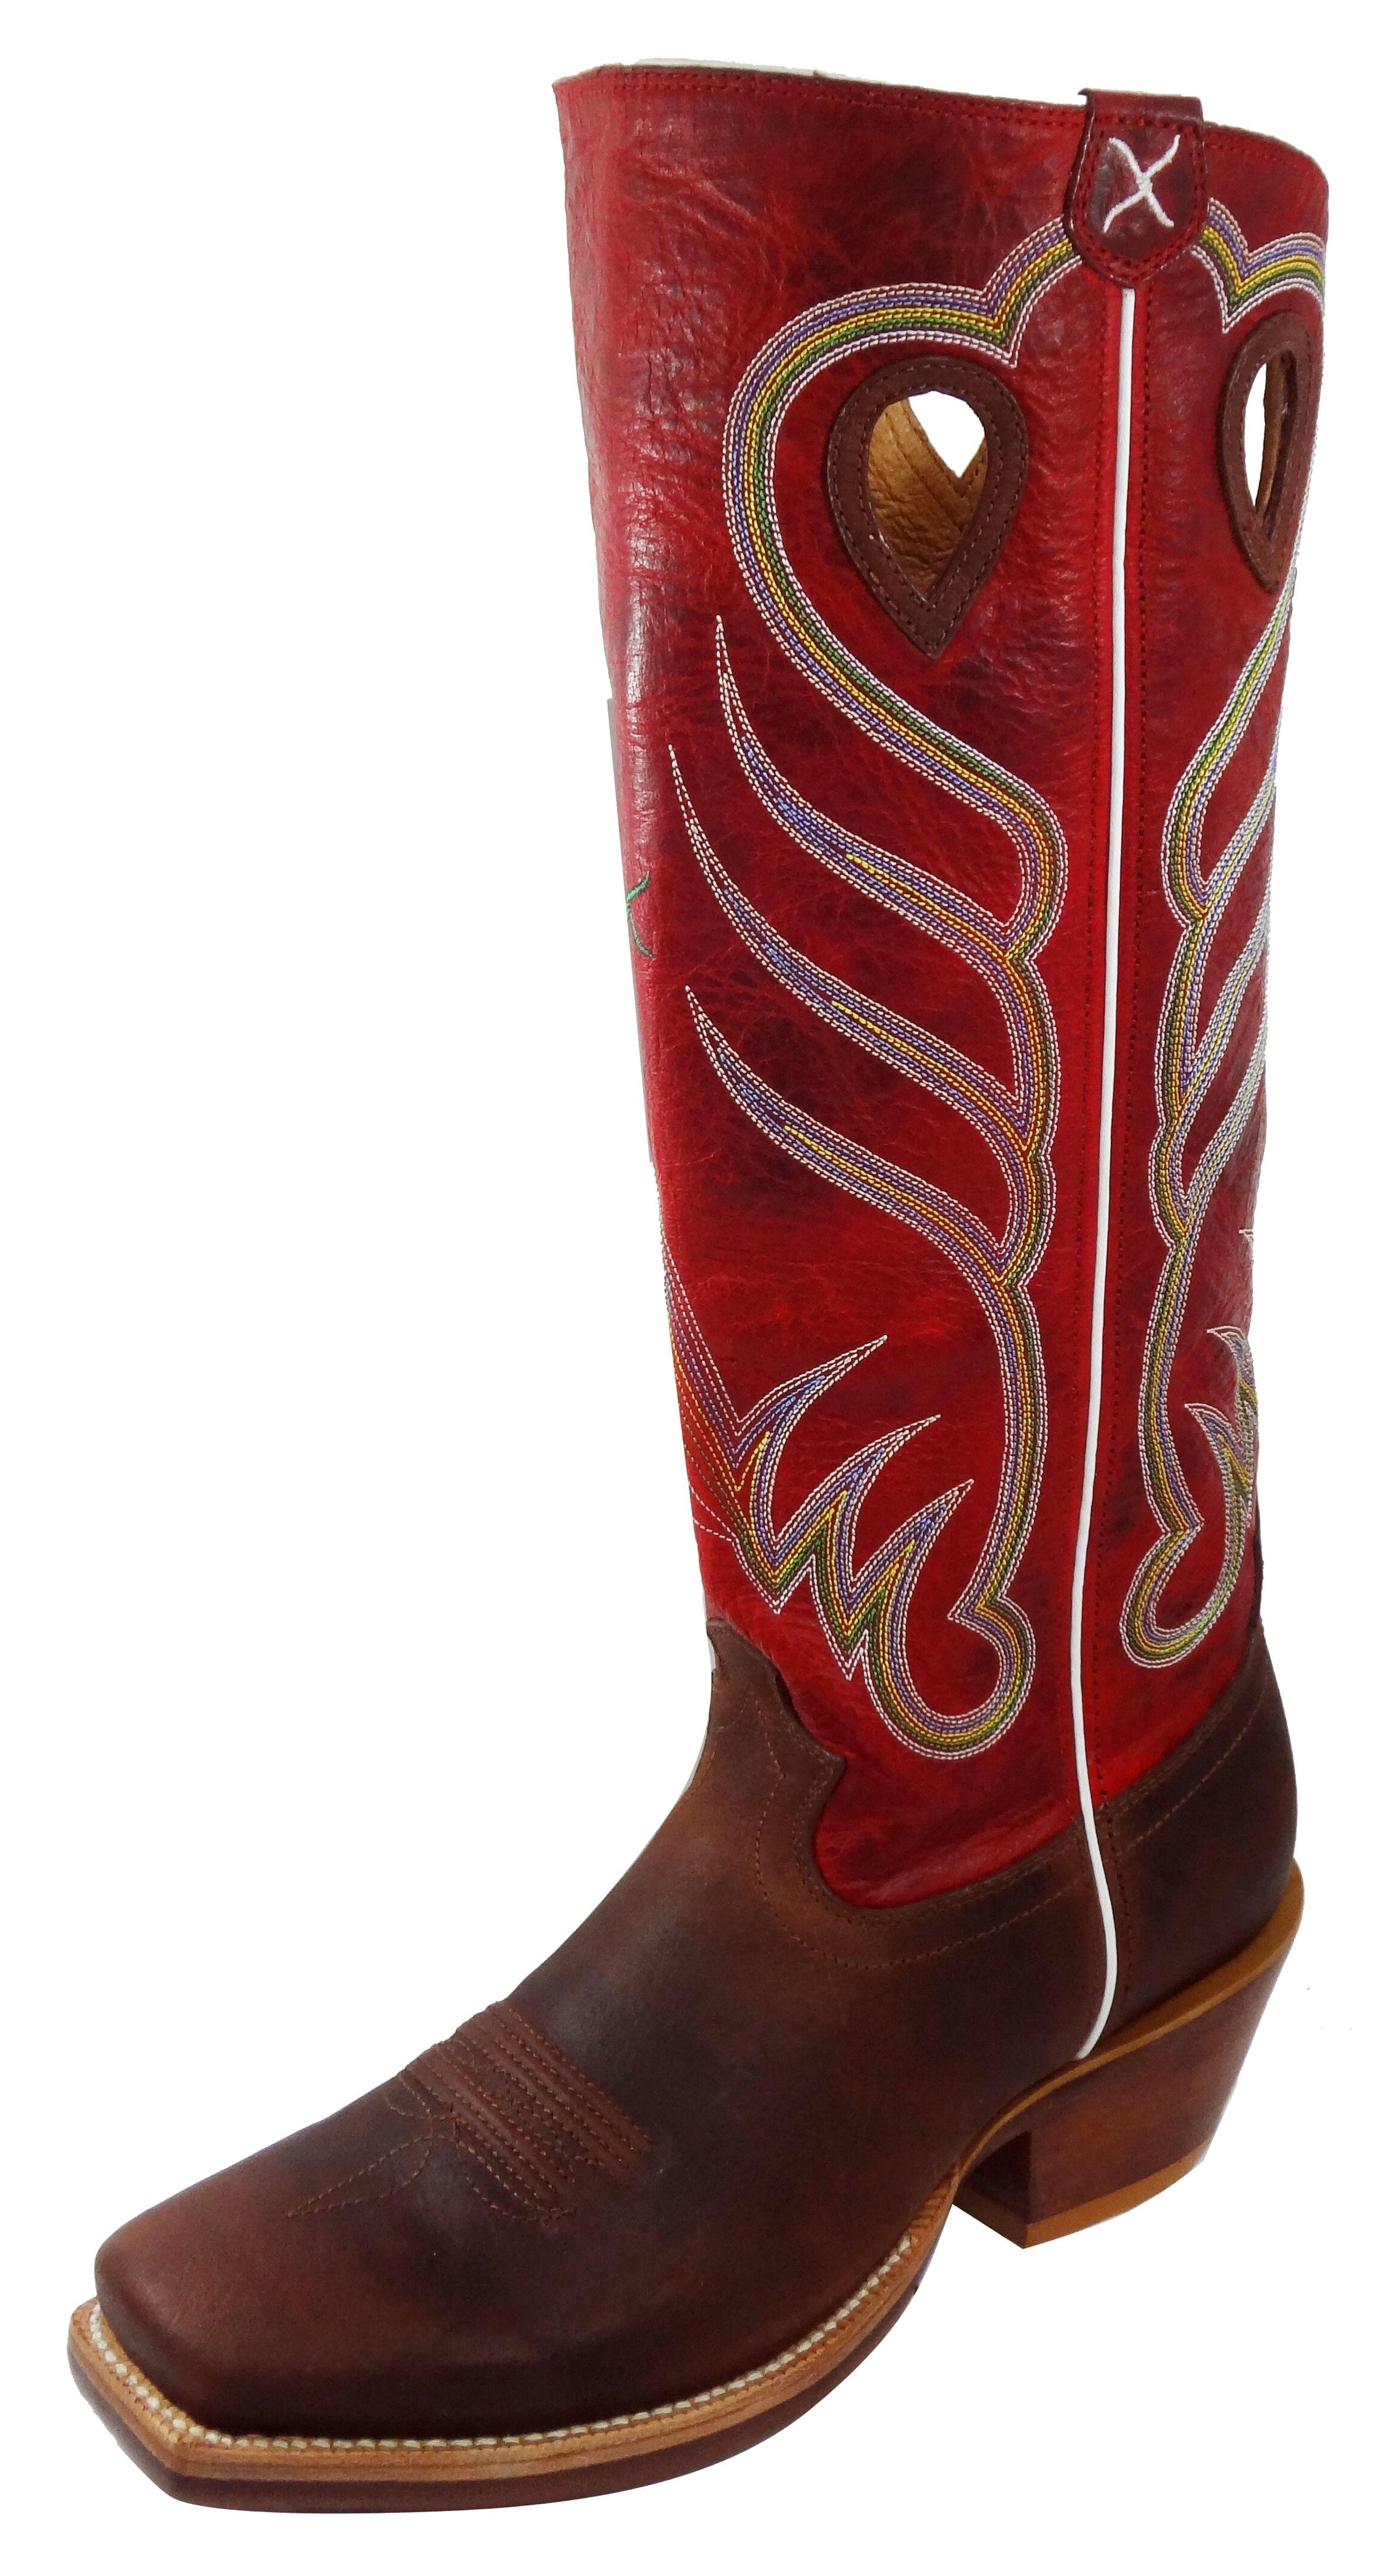 33b42f9d763 Twisted X Boots - Men's Buckaroo 17